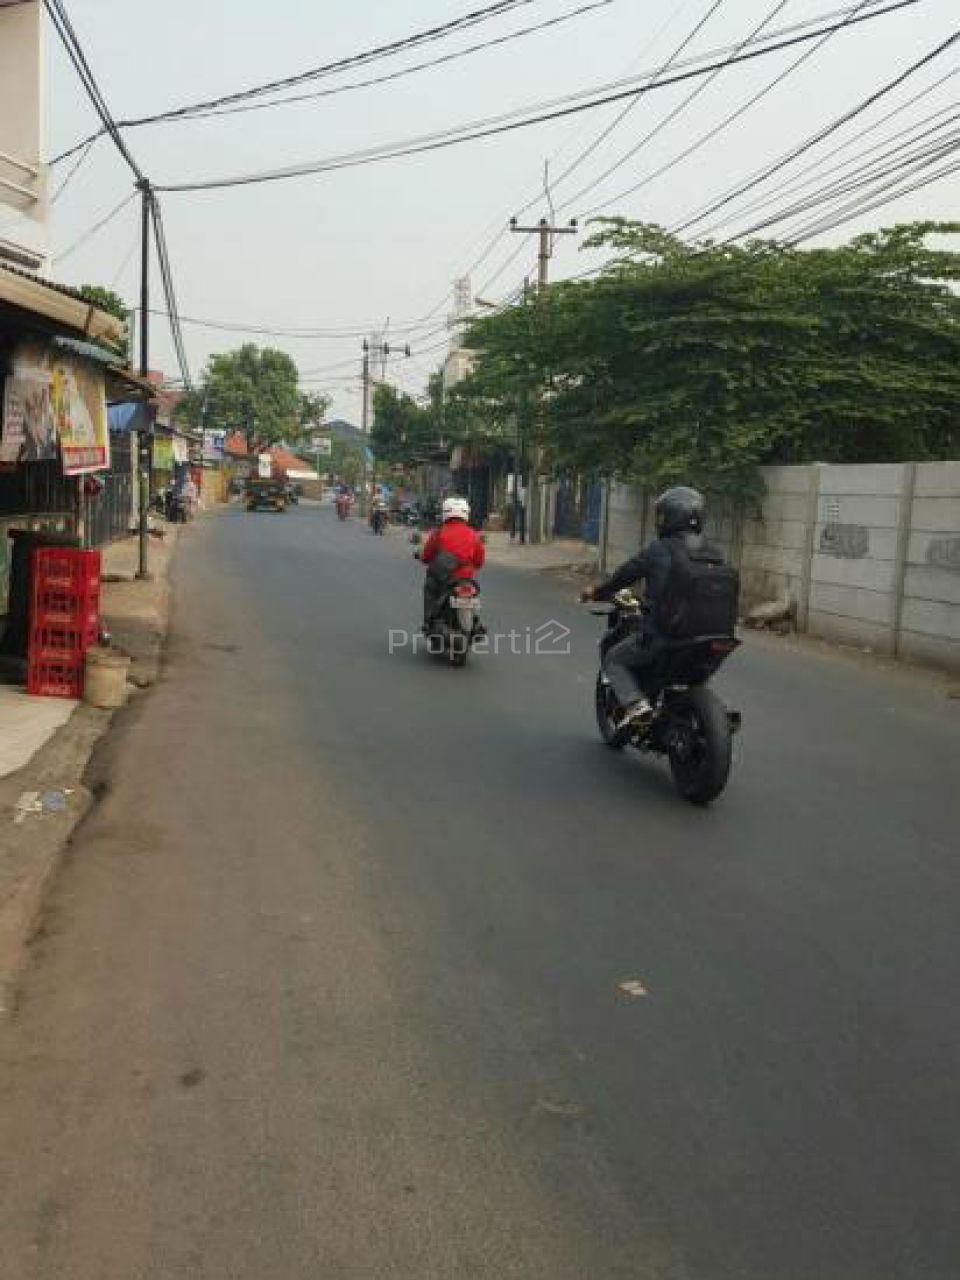 Commercial Land at South Kembangan, West Jakarta, Kebon Jeruk